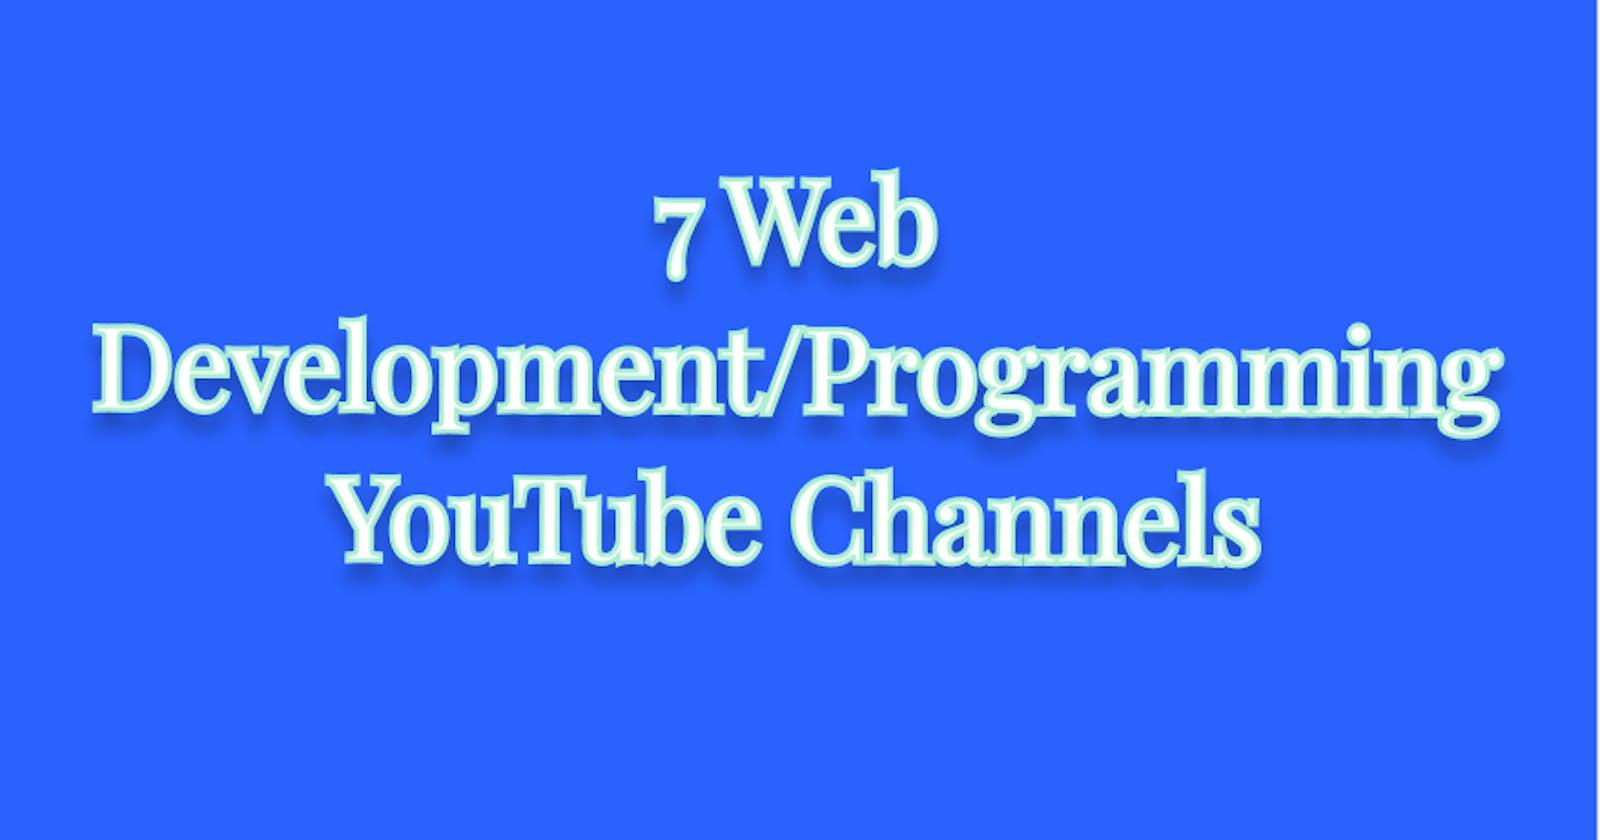 7 Web Development/Programming YouTube Channels